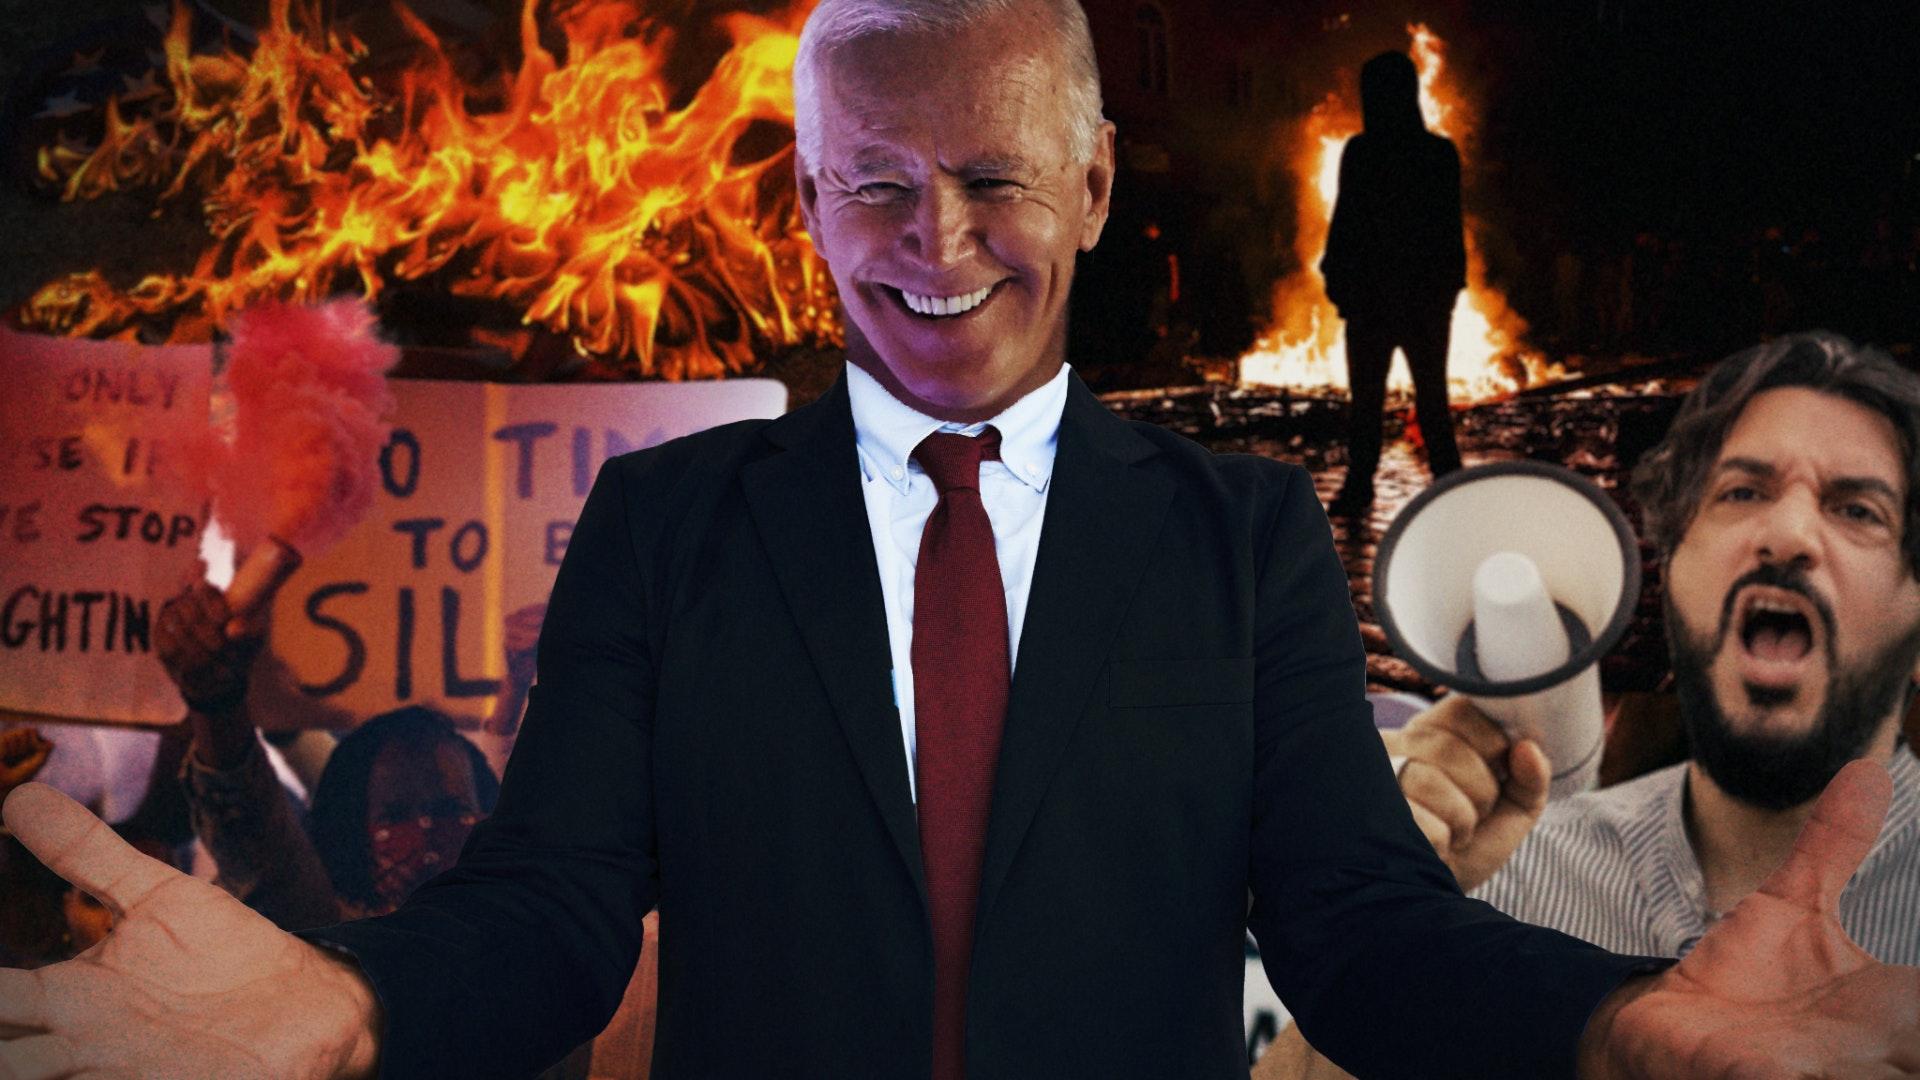 Ep. 1303 -Joe Biden Embraces The Radicals